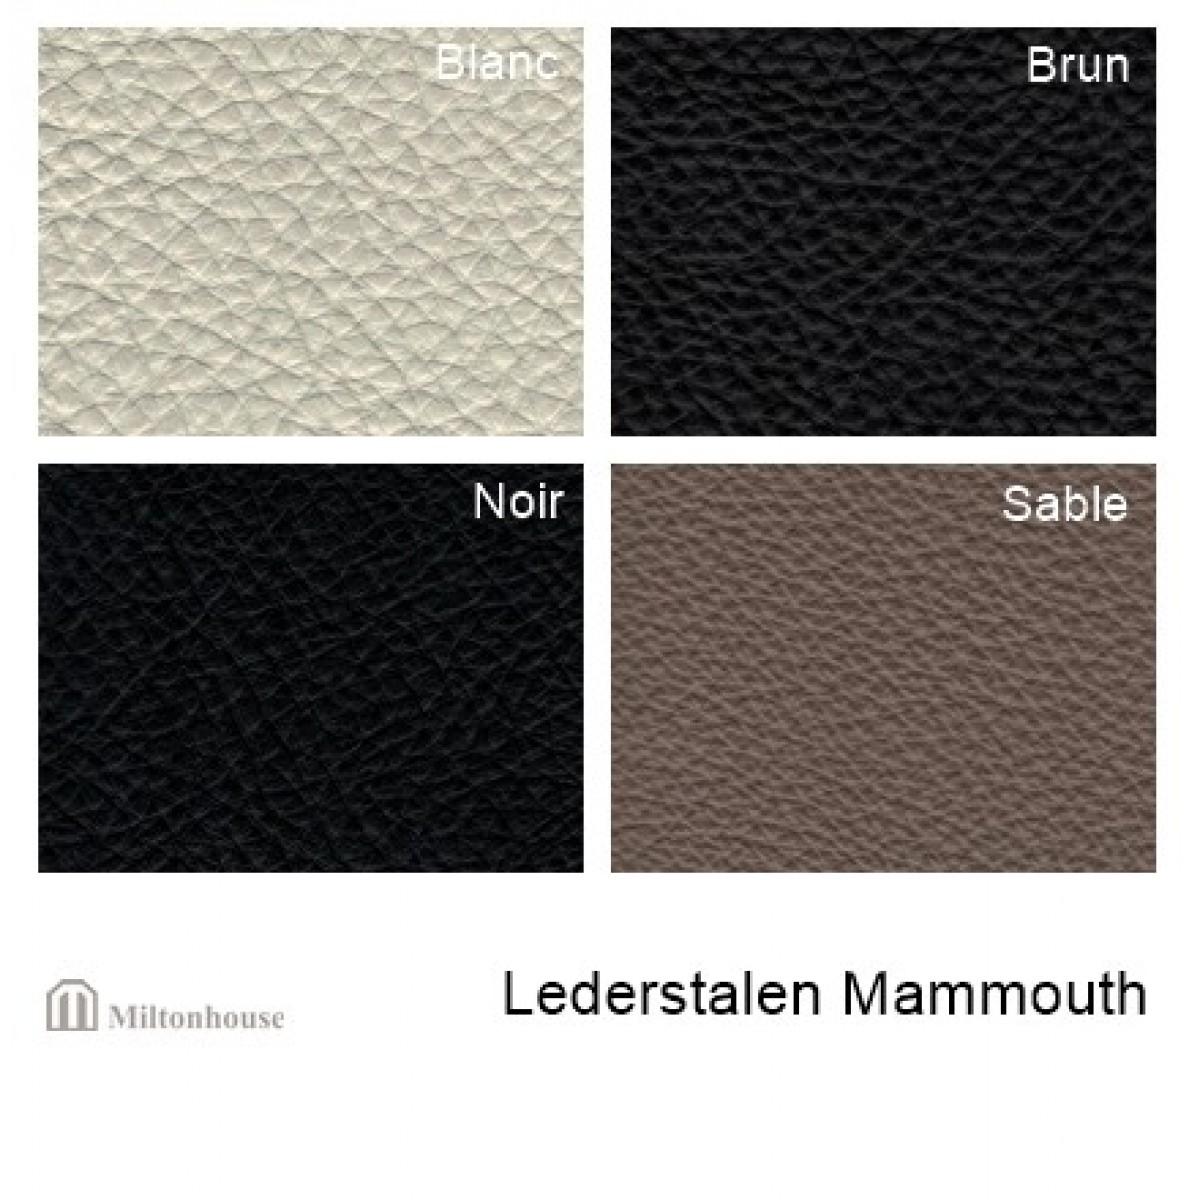 leer-leder-stalen-mammouth-maxfurn-miltonhouse